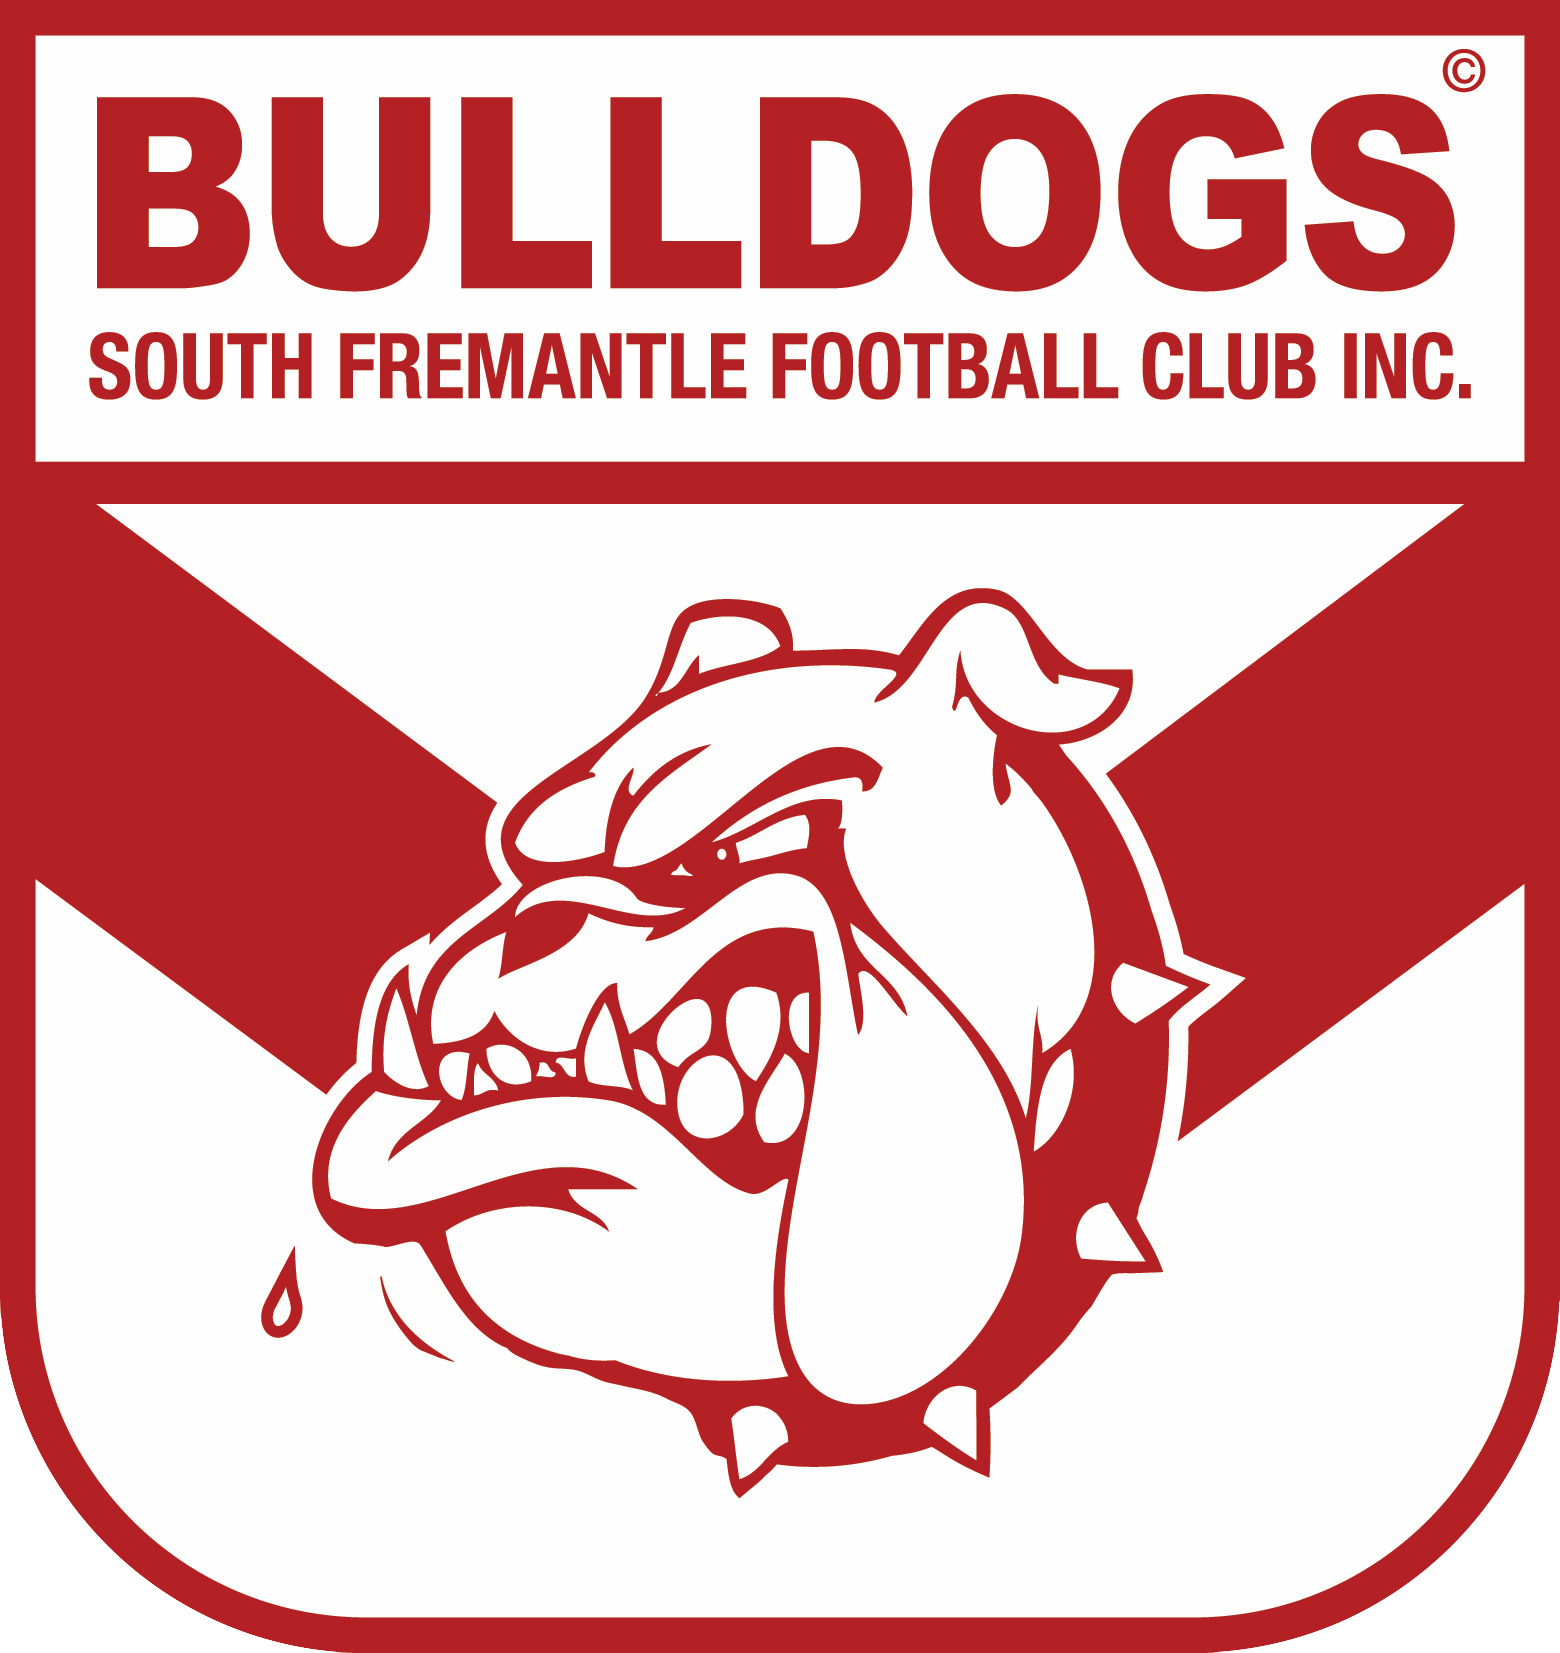 South Fremantle Football Club